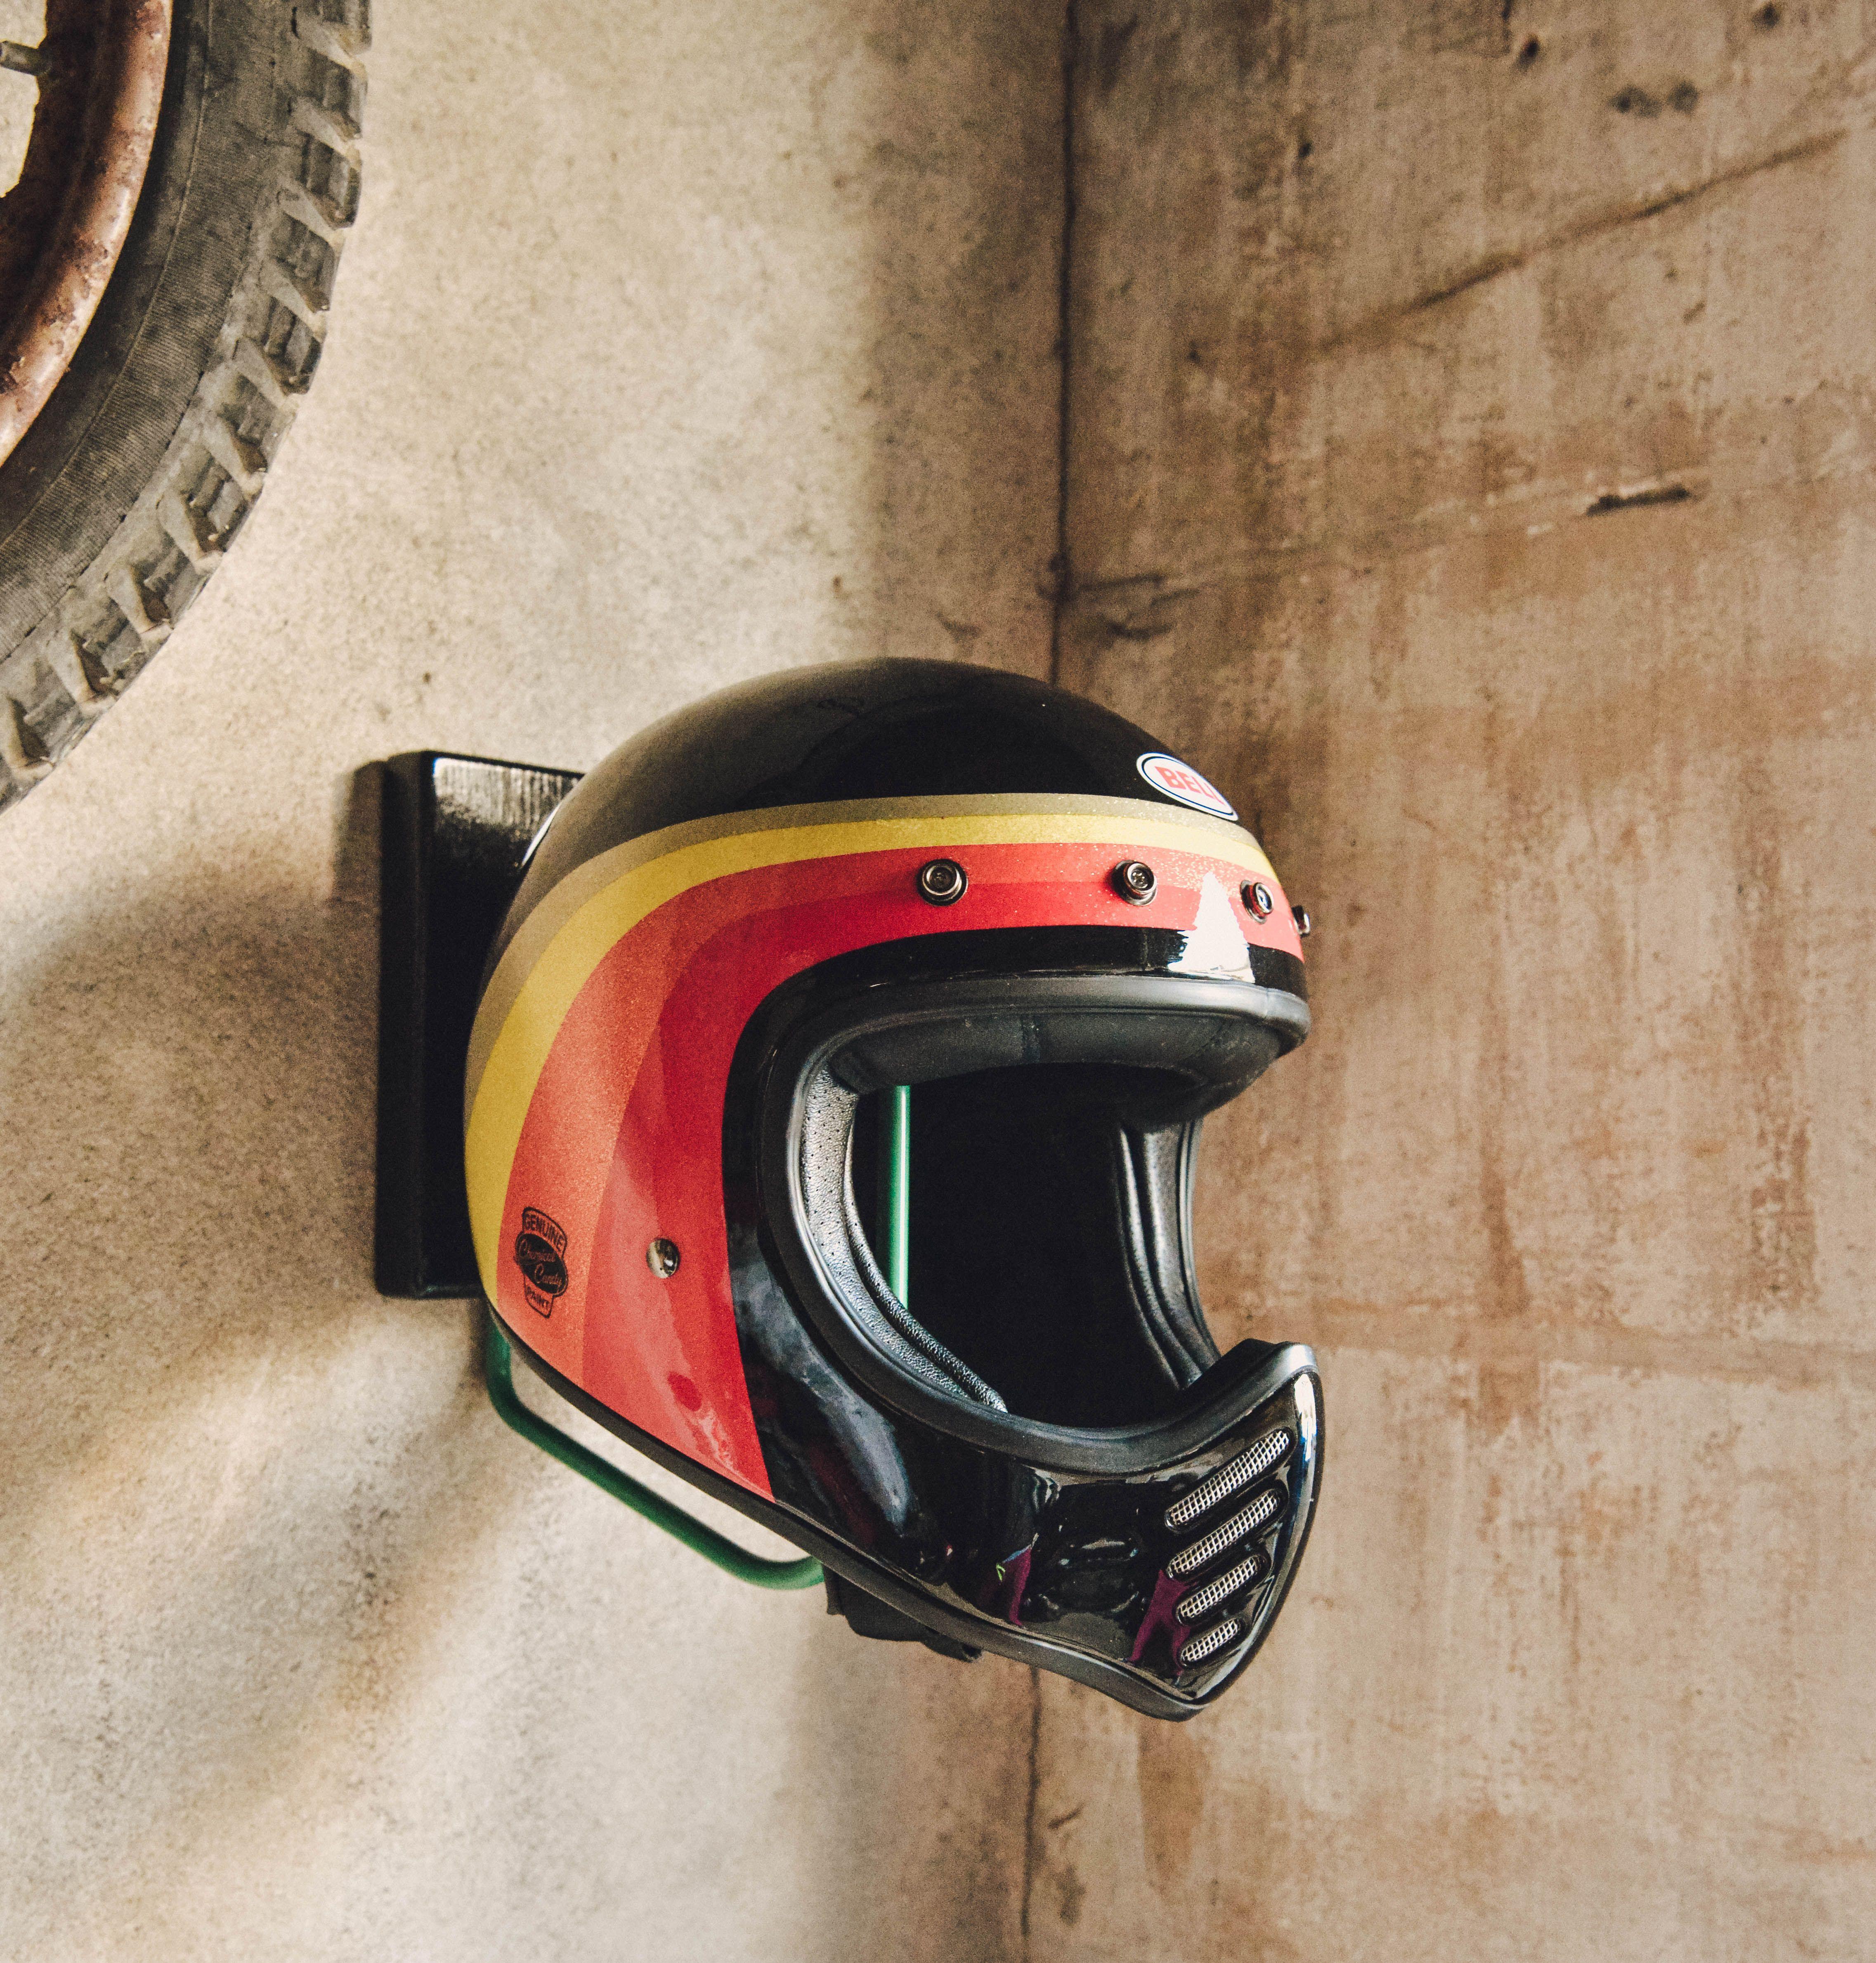 Porte Casque Helmet Rack France Waynscot Moto Helmet Accessoires Decor Interieur Handmade Casques Motos Chopper Bobber Casque Moto Vintage